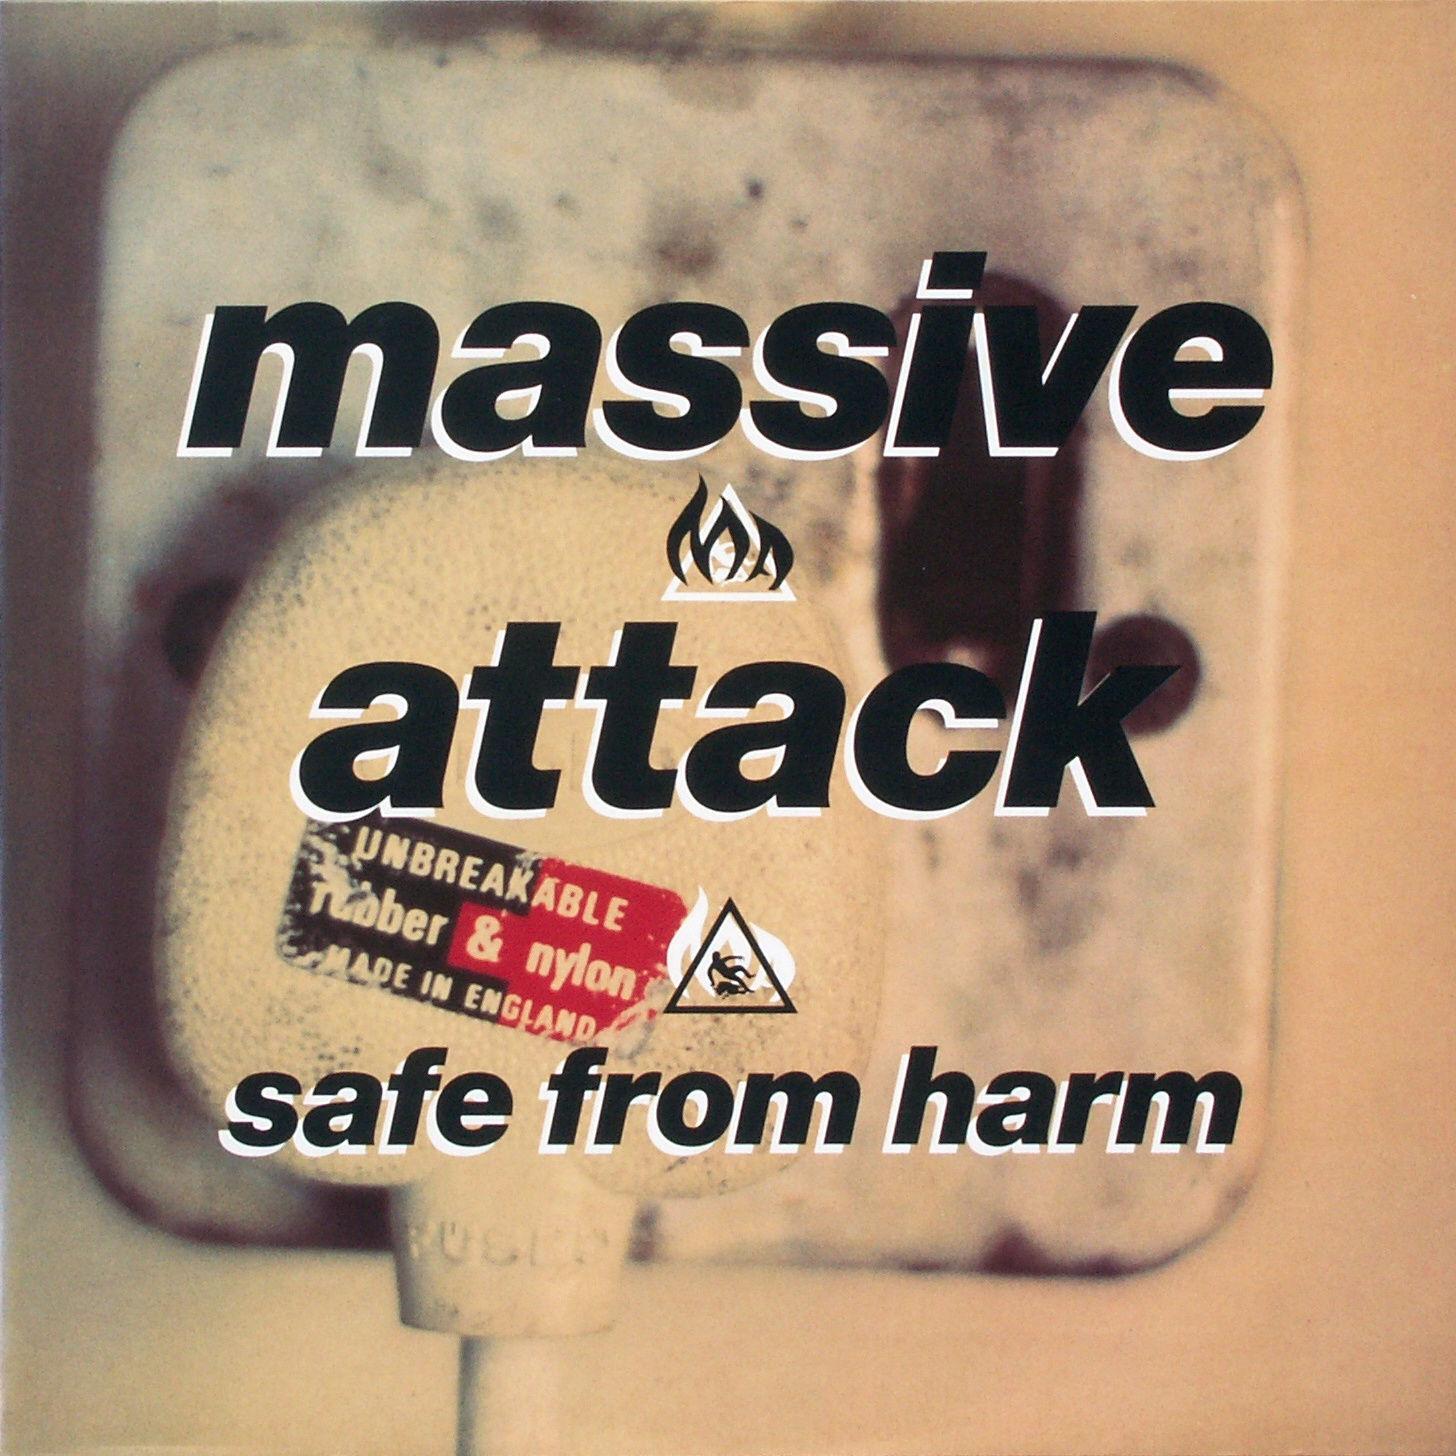 MASSIVE ATTACK - Safe From Harm - Maxi x 1